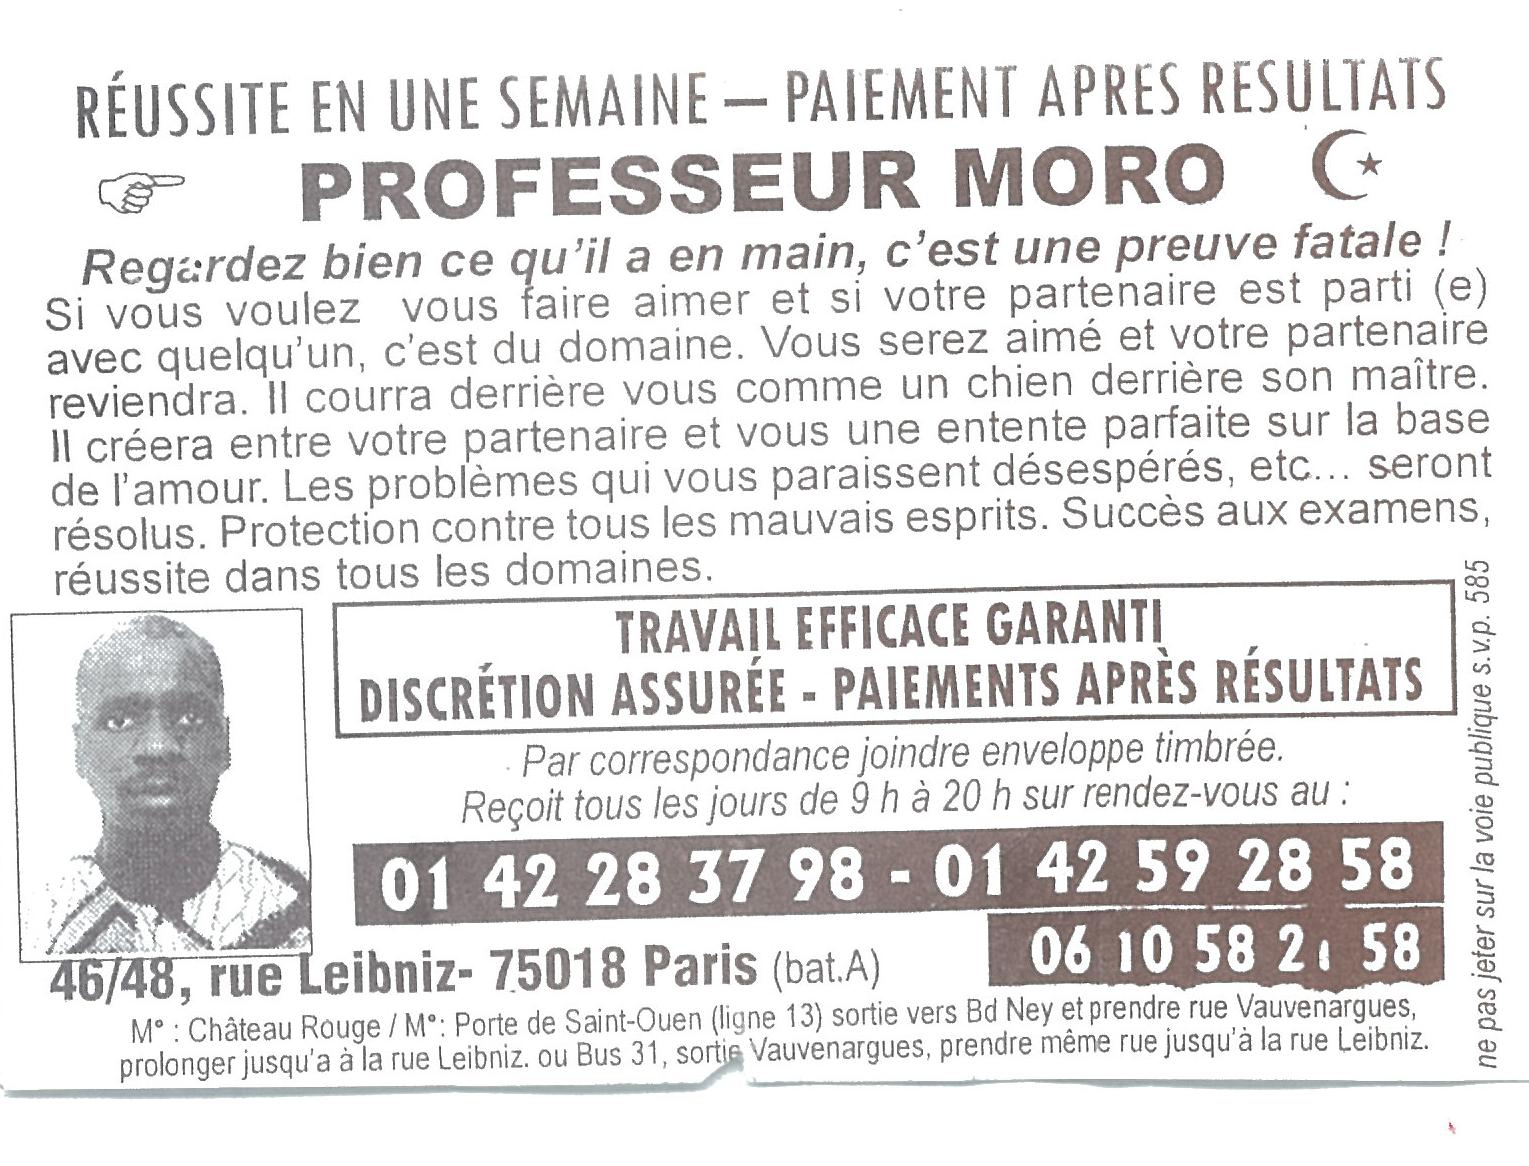 Prof Moro